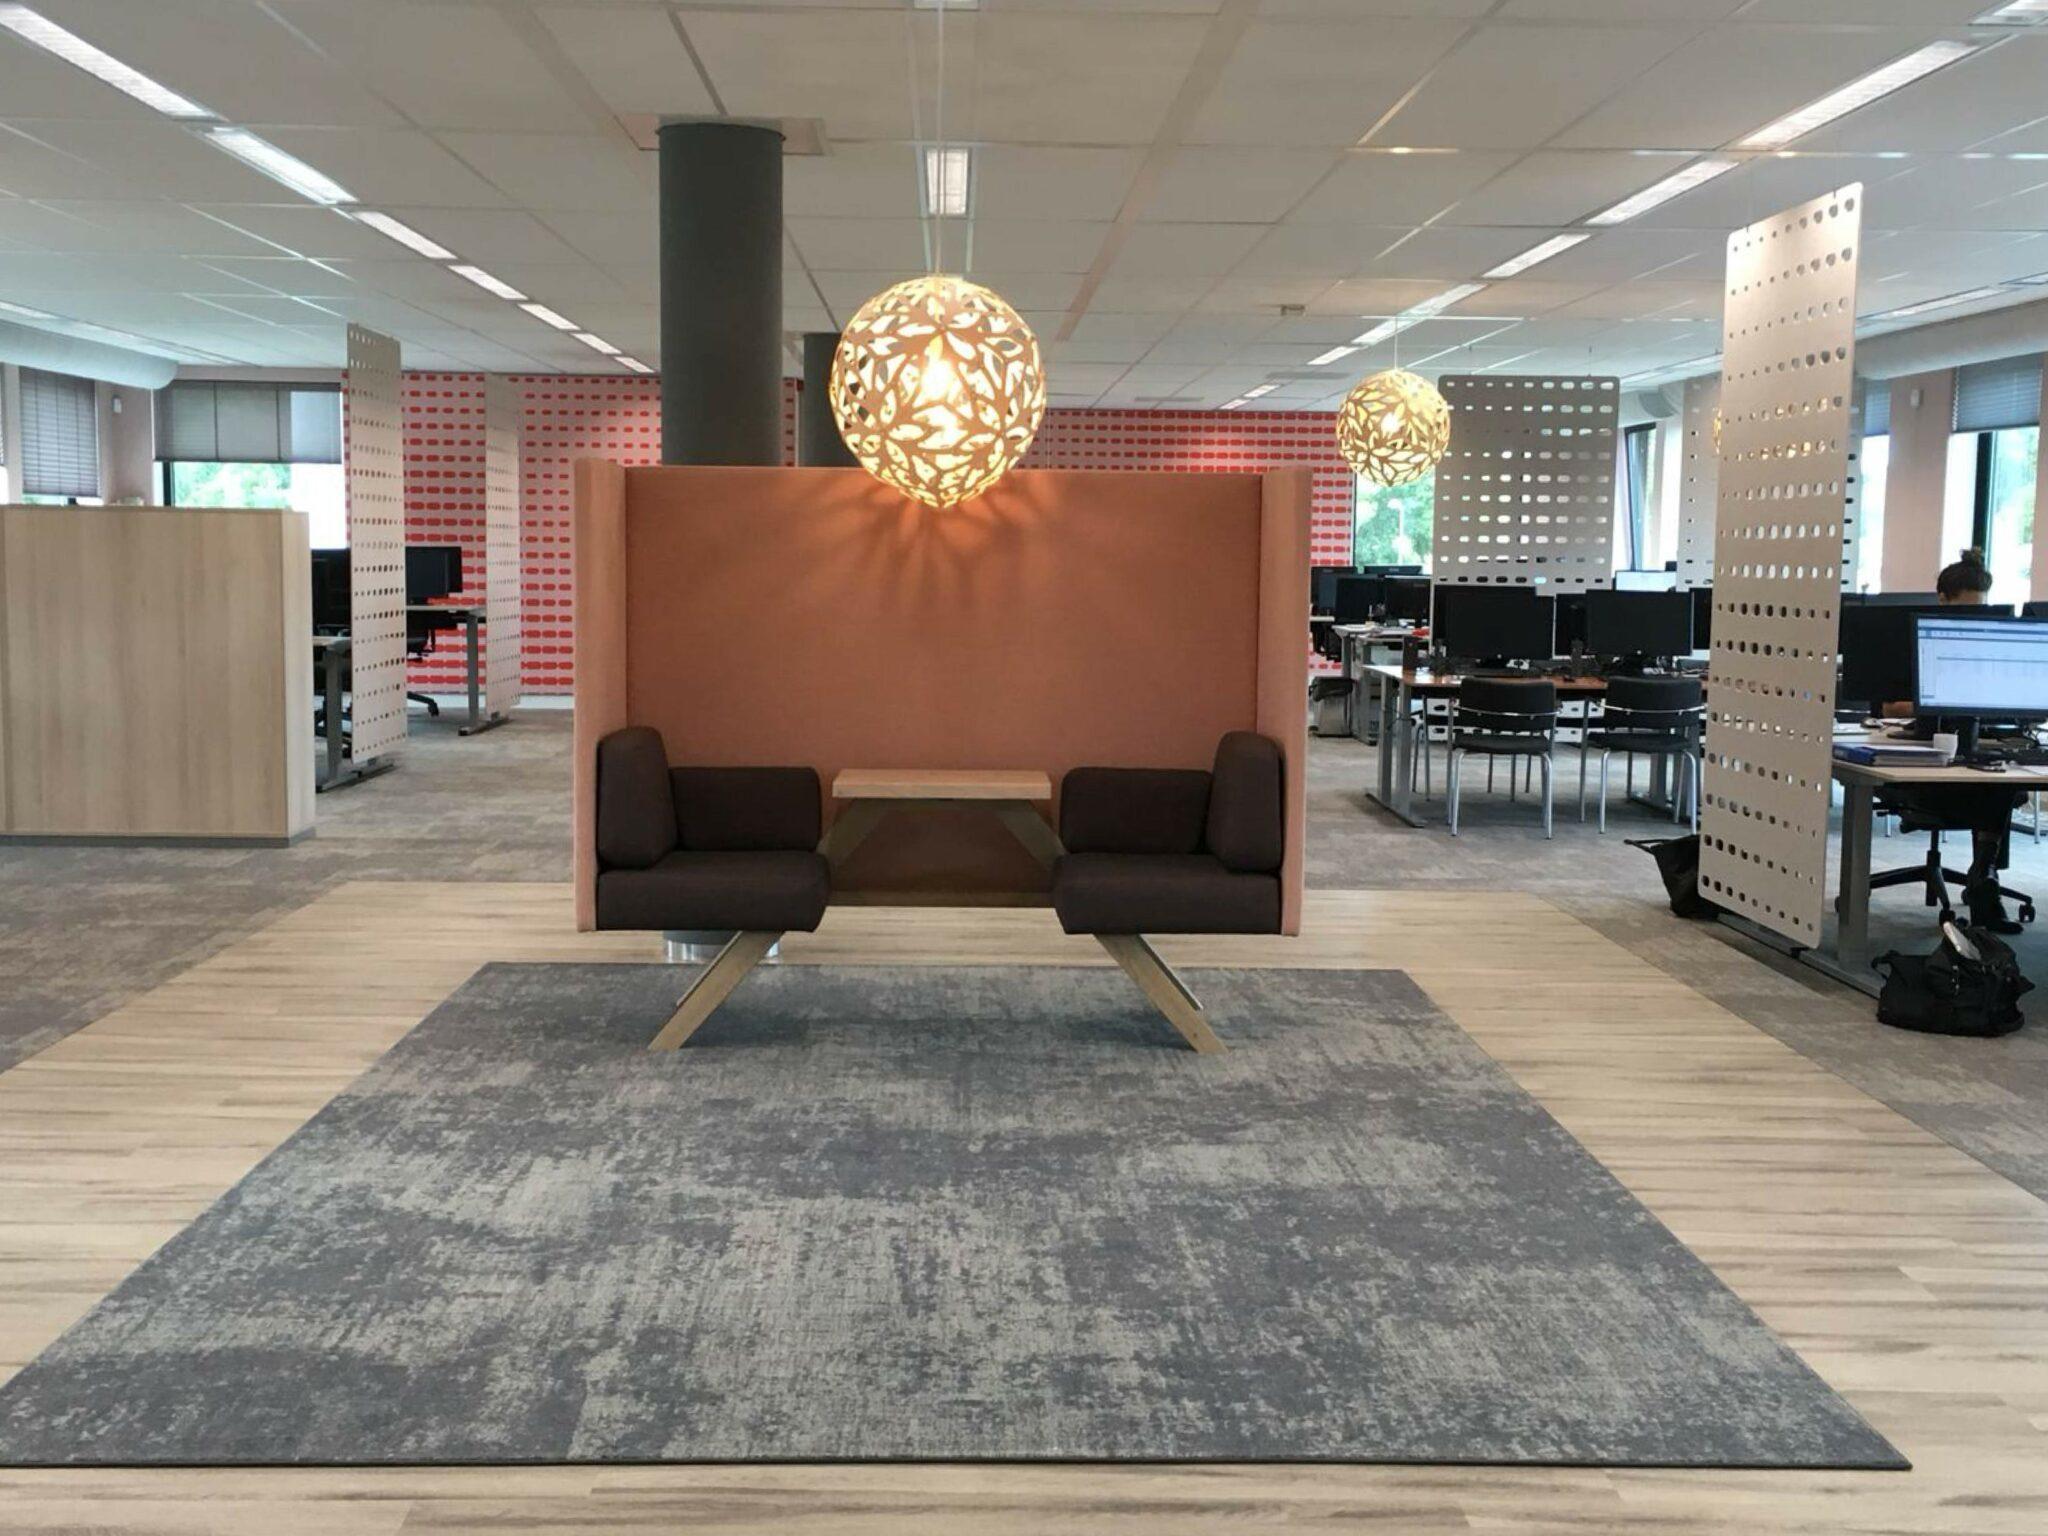 Jeugdzorg project Heering Office Den Haag